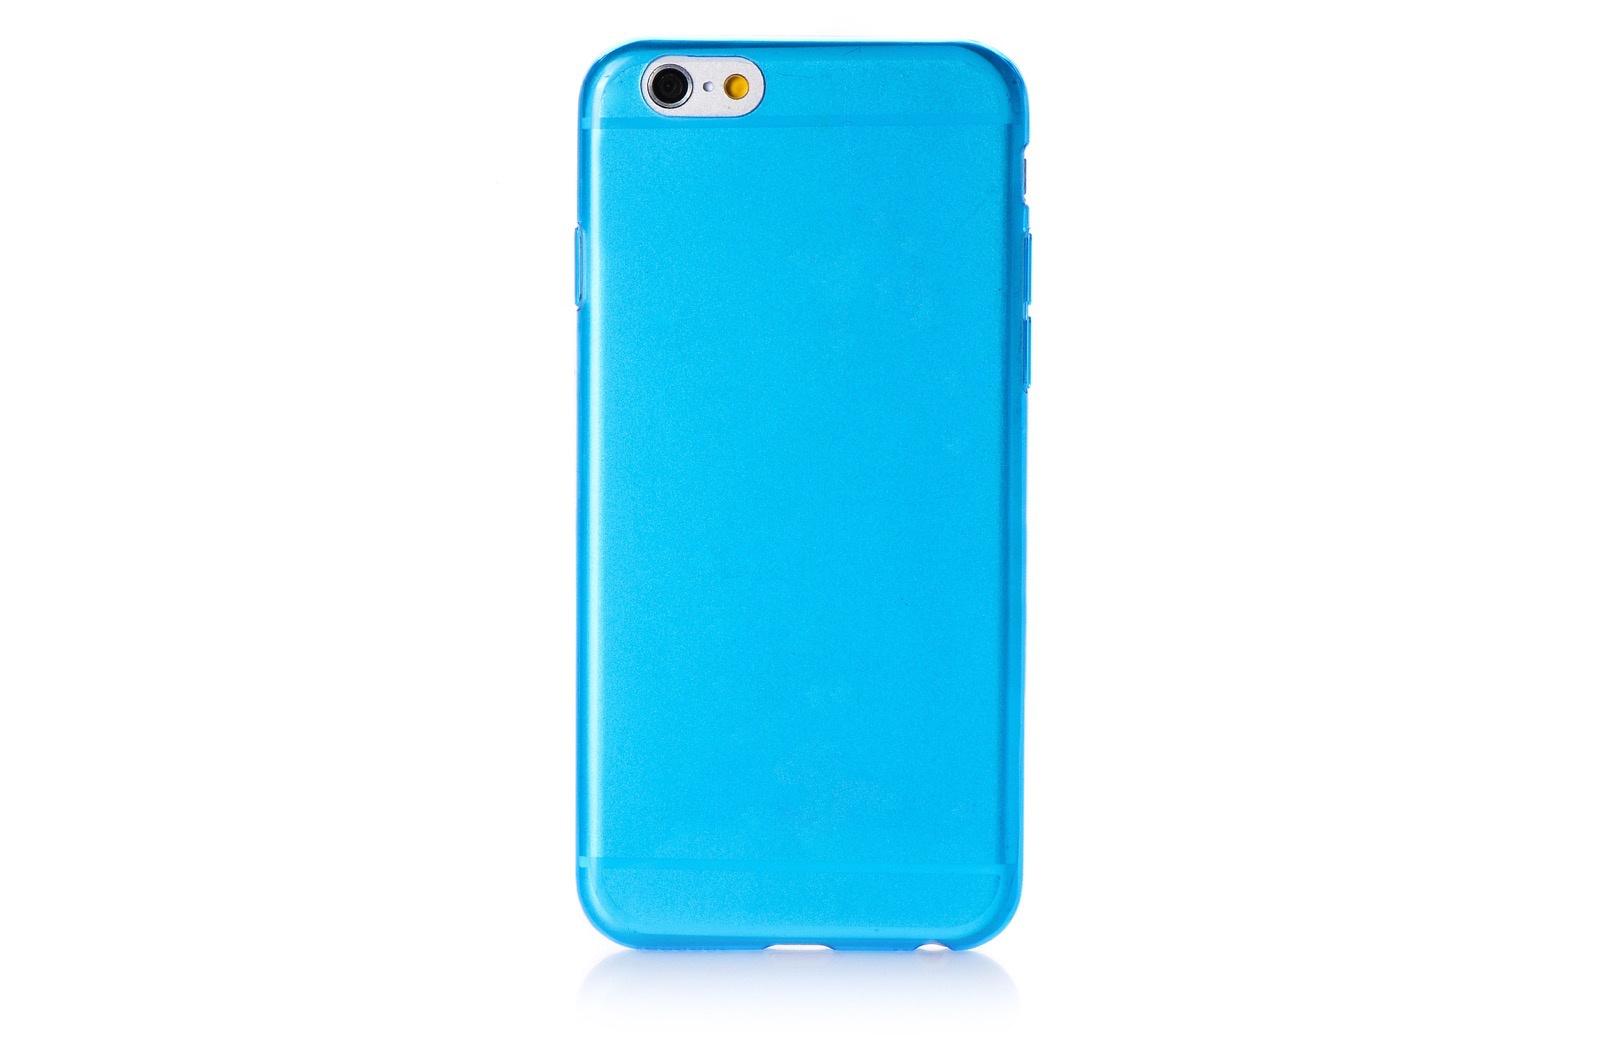 "Чехол для сотового телефона Gurdini Чехол накладка iPhone 6/6S 4.7"" Gurdini силикон 0.3 глянцевый, 580027, голубой"